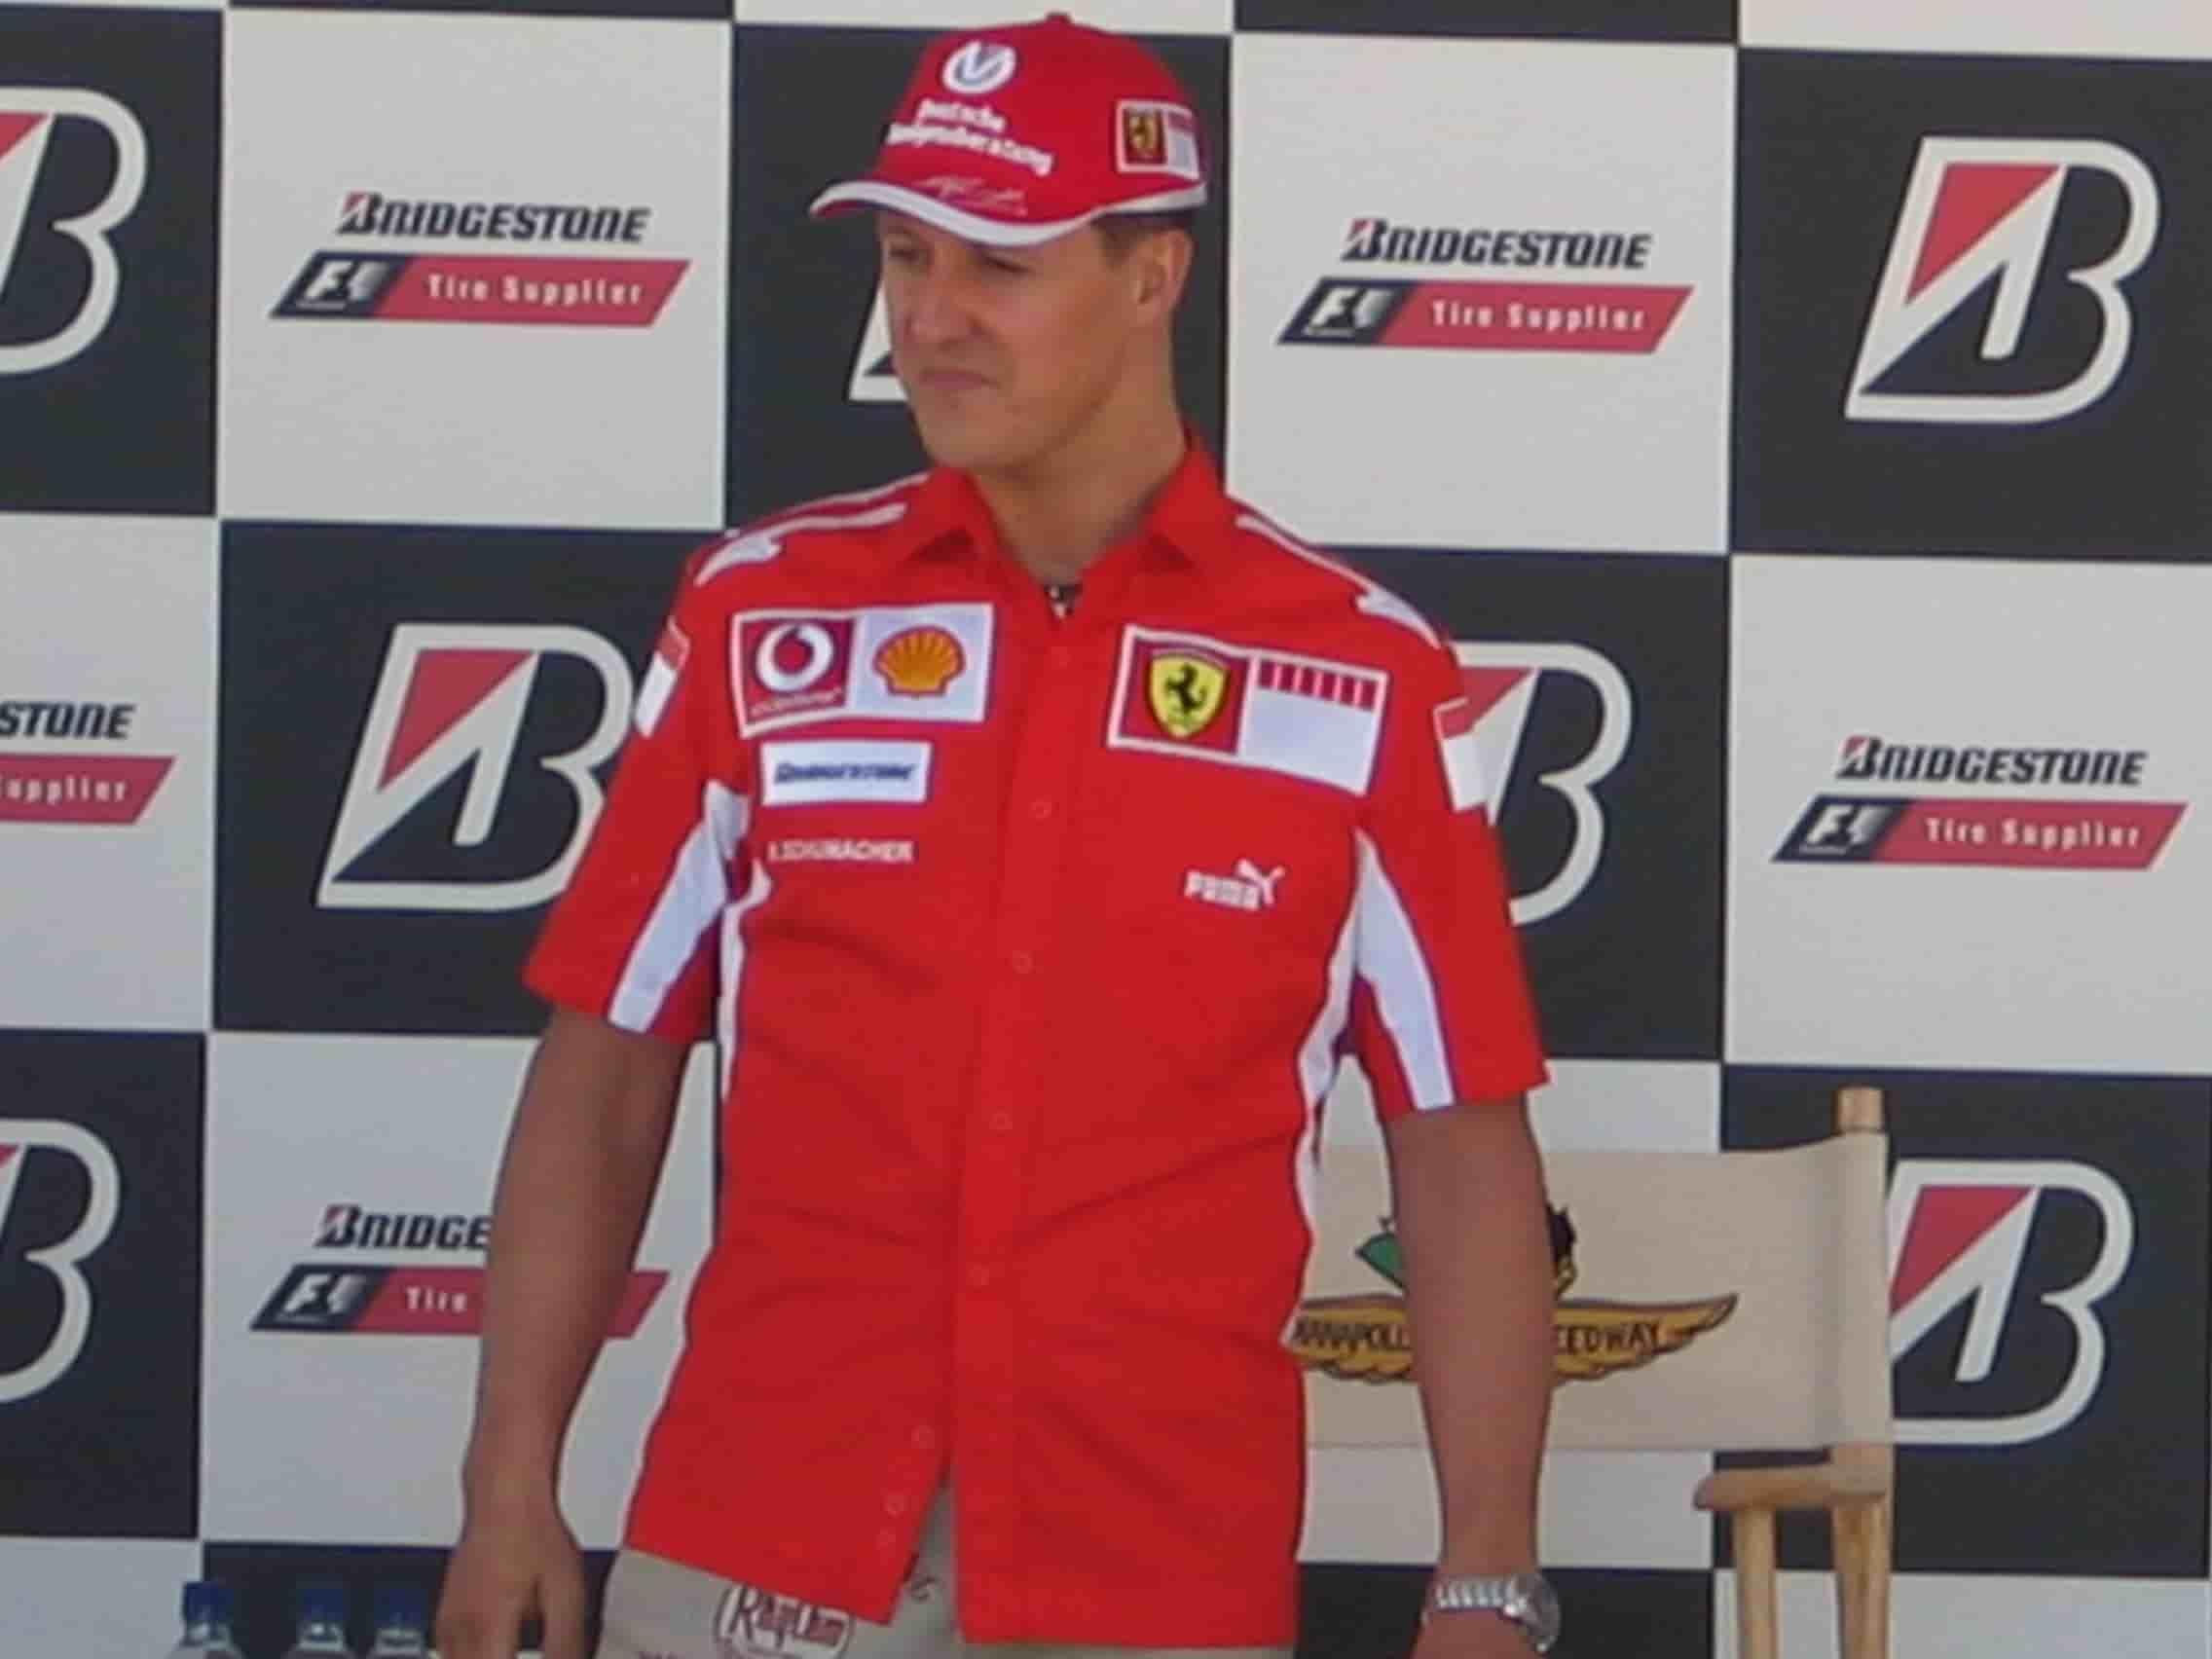 Micheal Schumacher Formula1